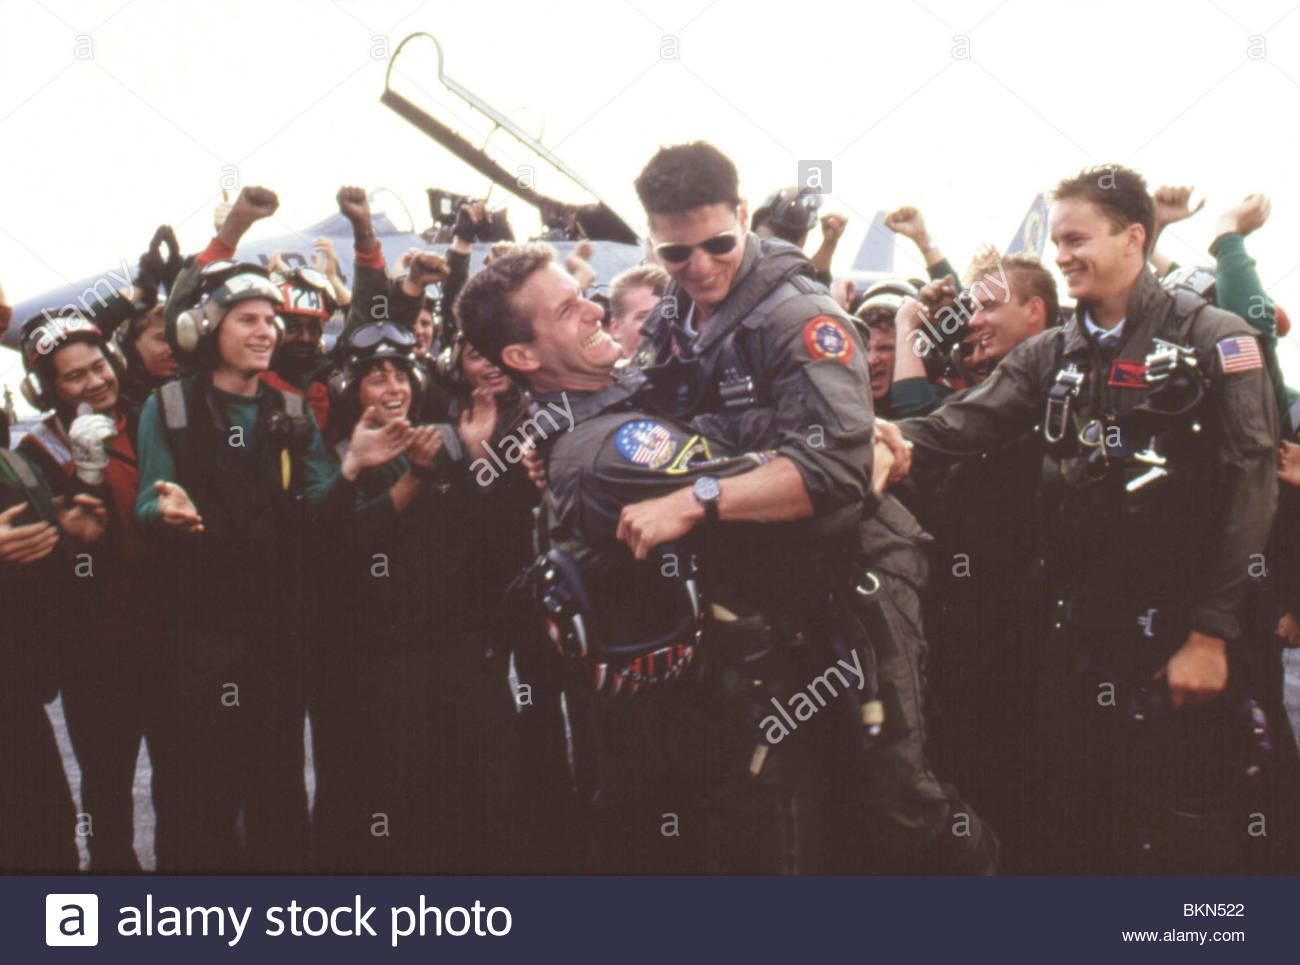 TOP GUN (1986) RICK ROSSOVICH, TOM CRUISE, TIM ROBBINS TPG ...